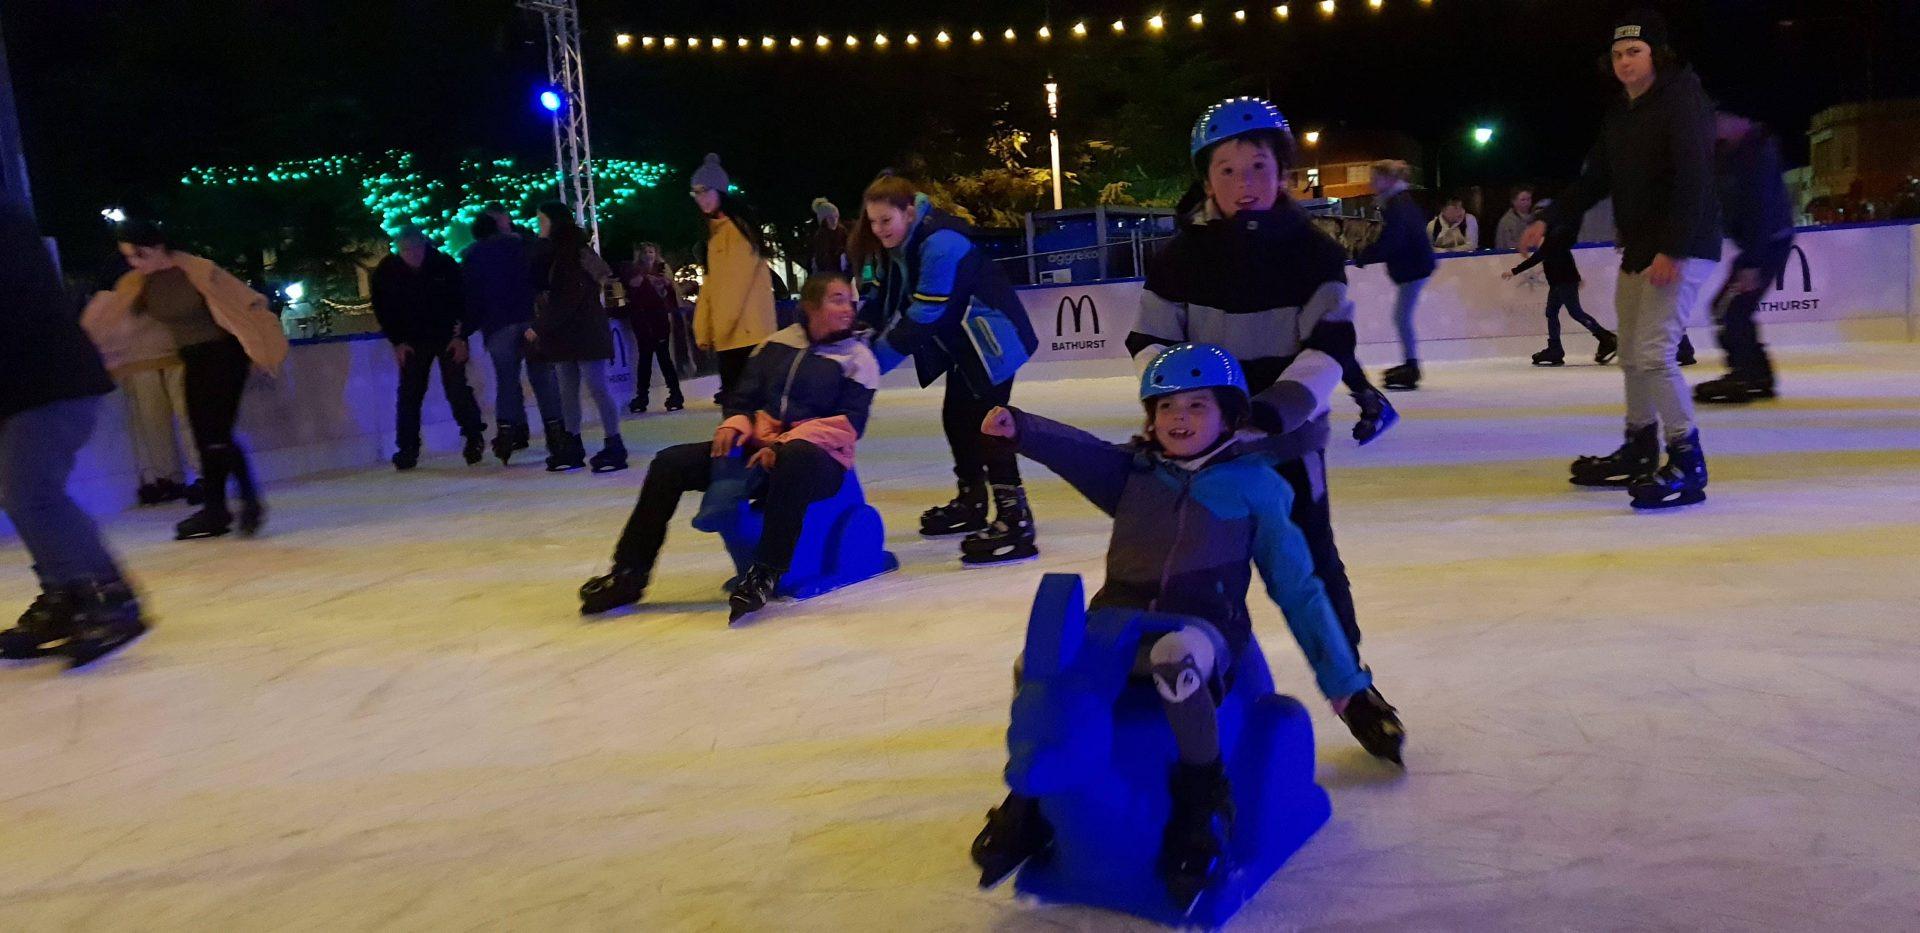 Bathurst Ice rink